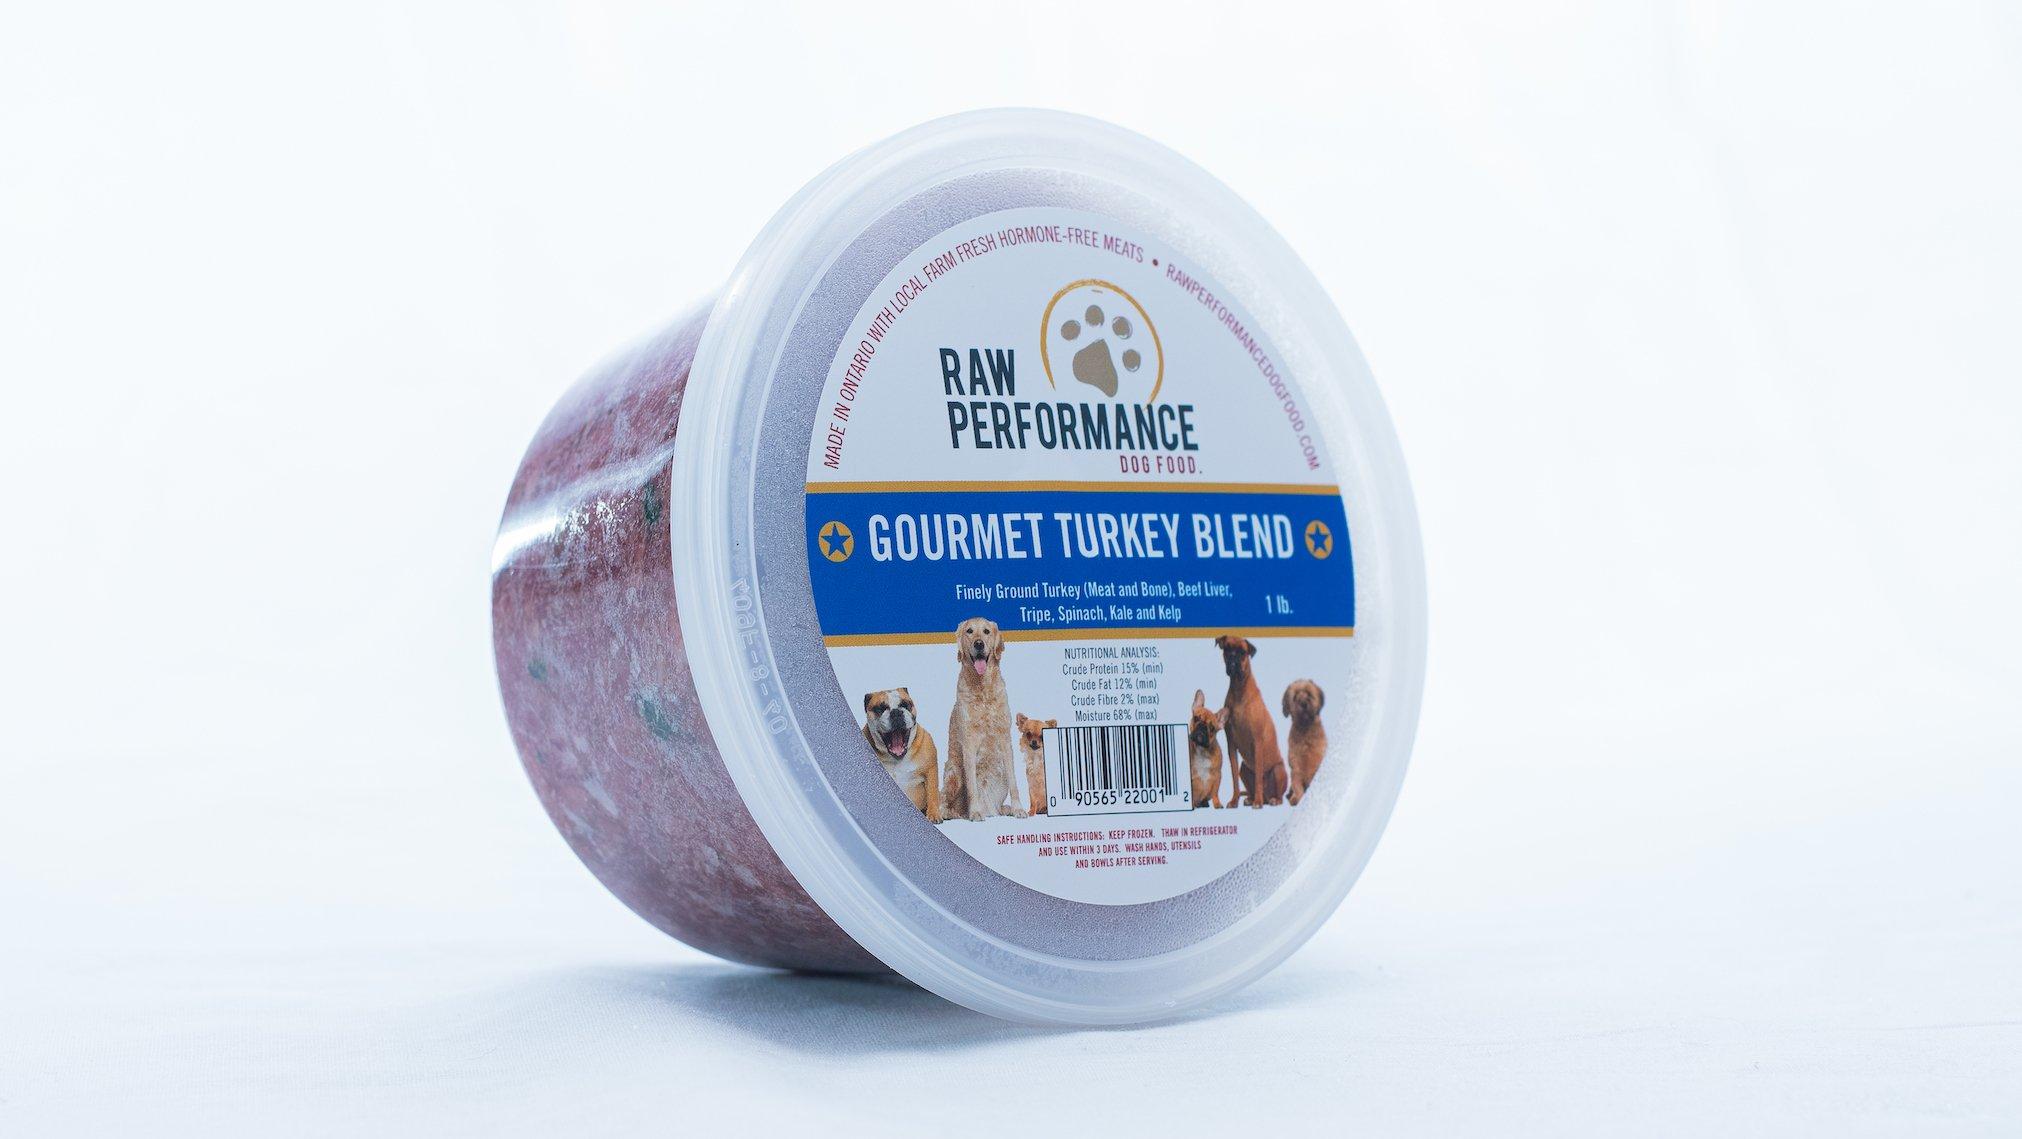 Raw Performance Gourmet Blend Turkey Dog Food, 1-lb